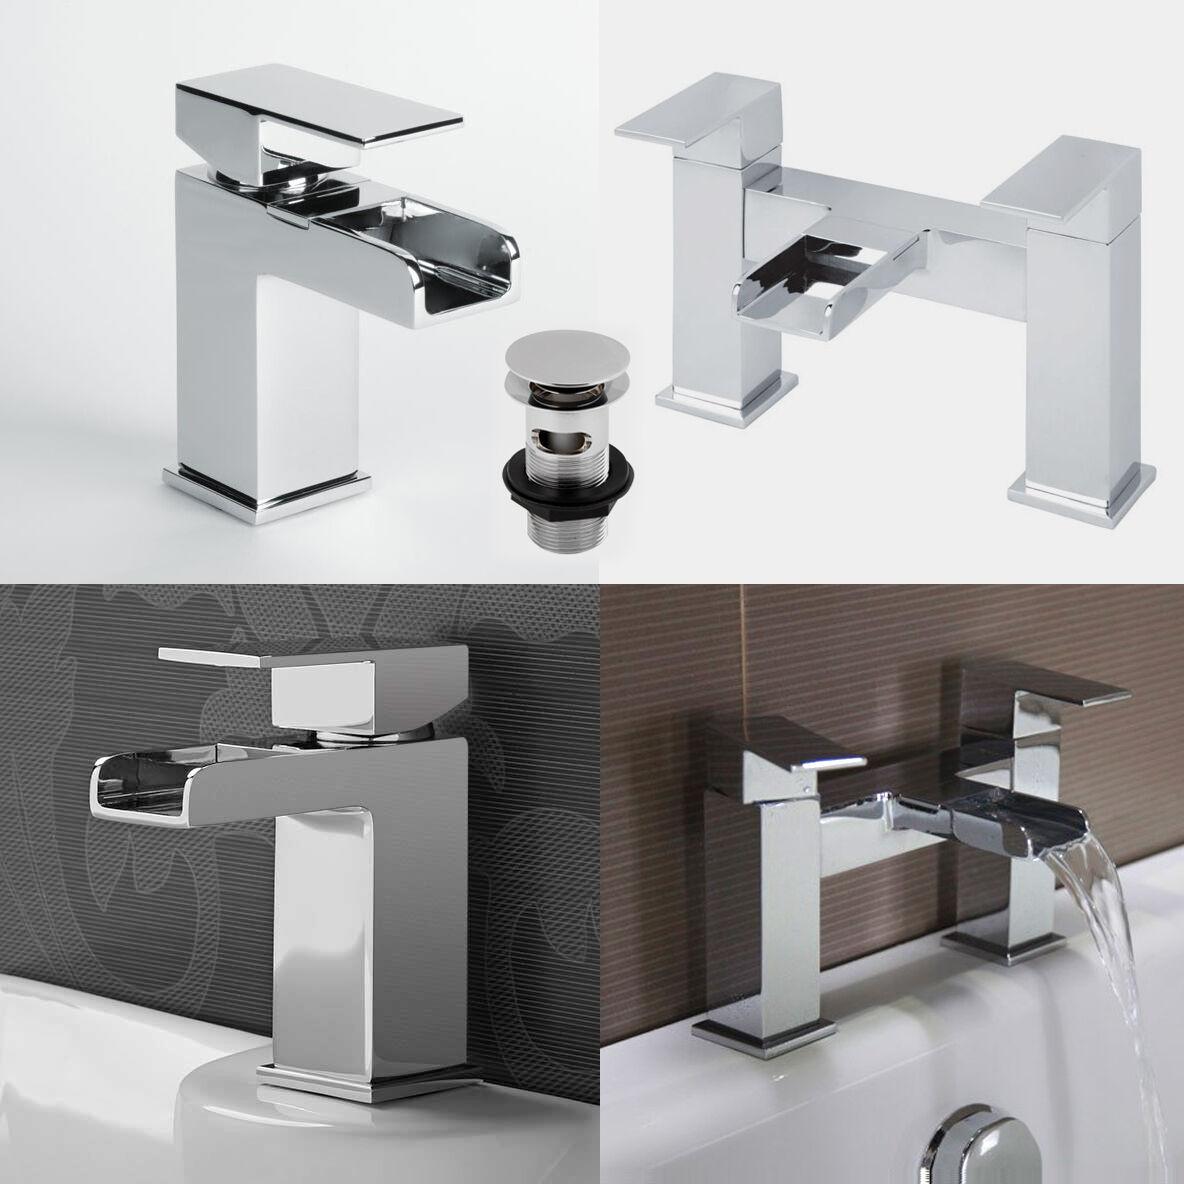 Maestro bath slide front page - Tap Bathroom Waterfall Mixer Basin Bath Filler Taps Chrome Wash Sink Bathtub